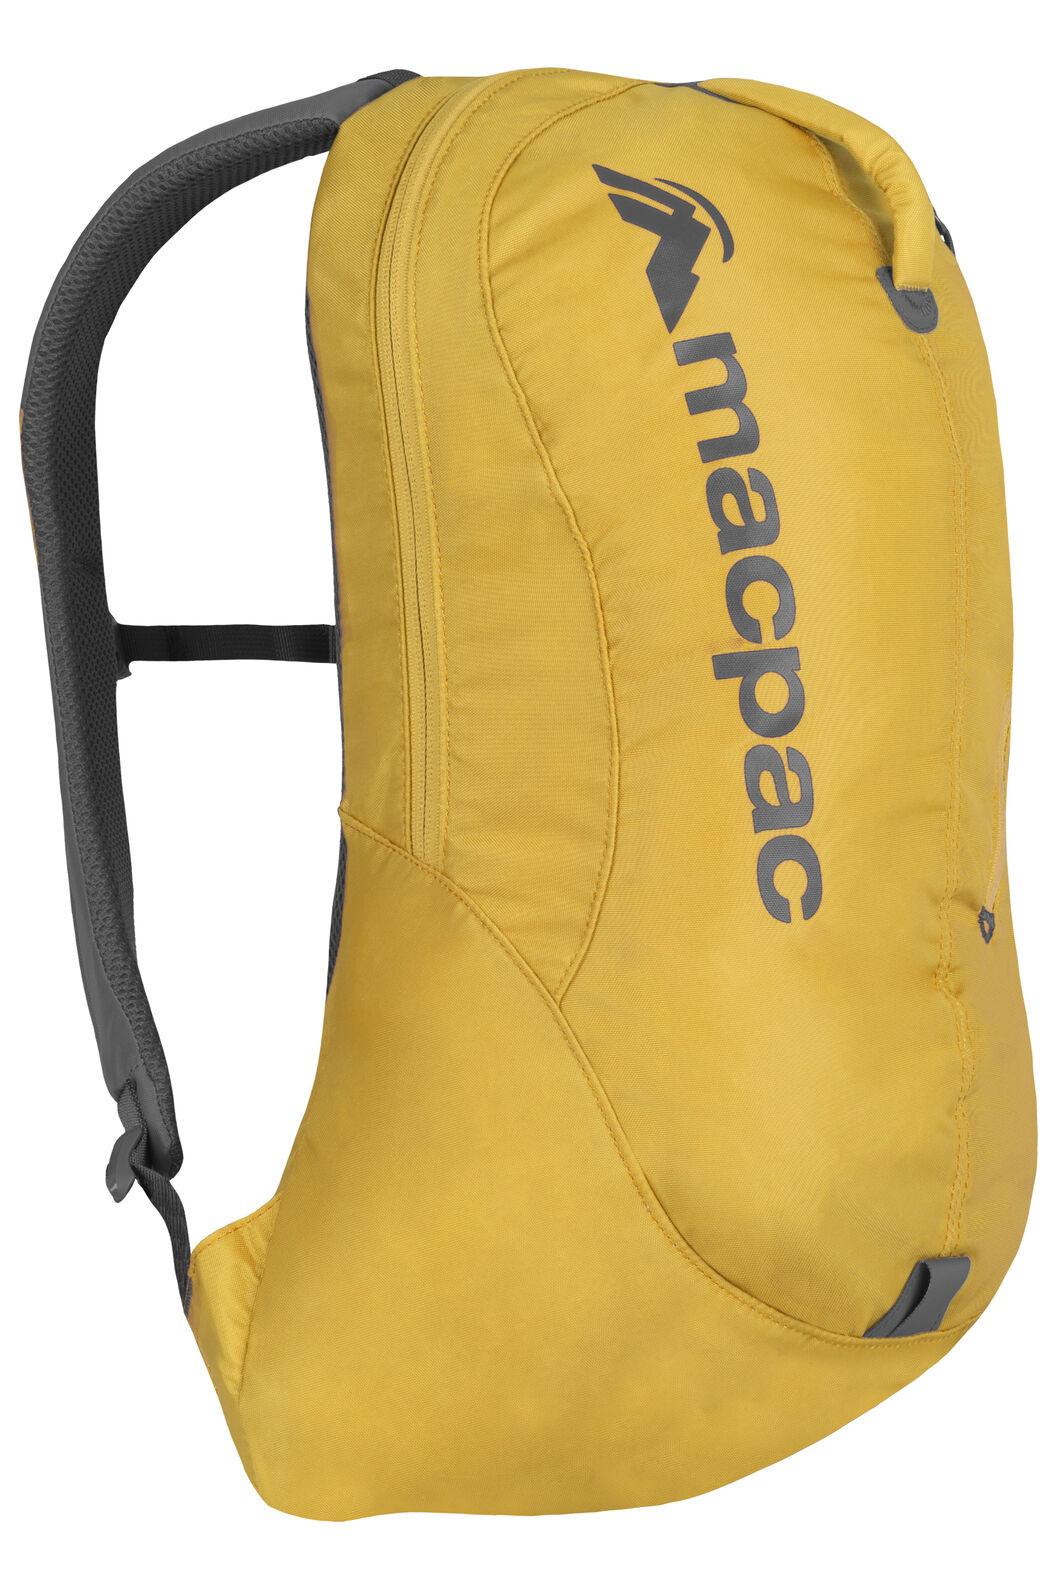 Macpac Kahuna 1.1 18L Backpack, Lemon Curry, hi-res